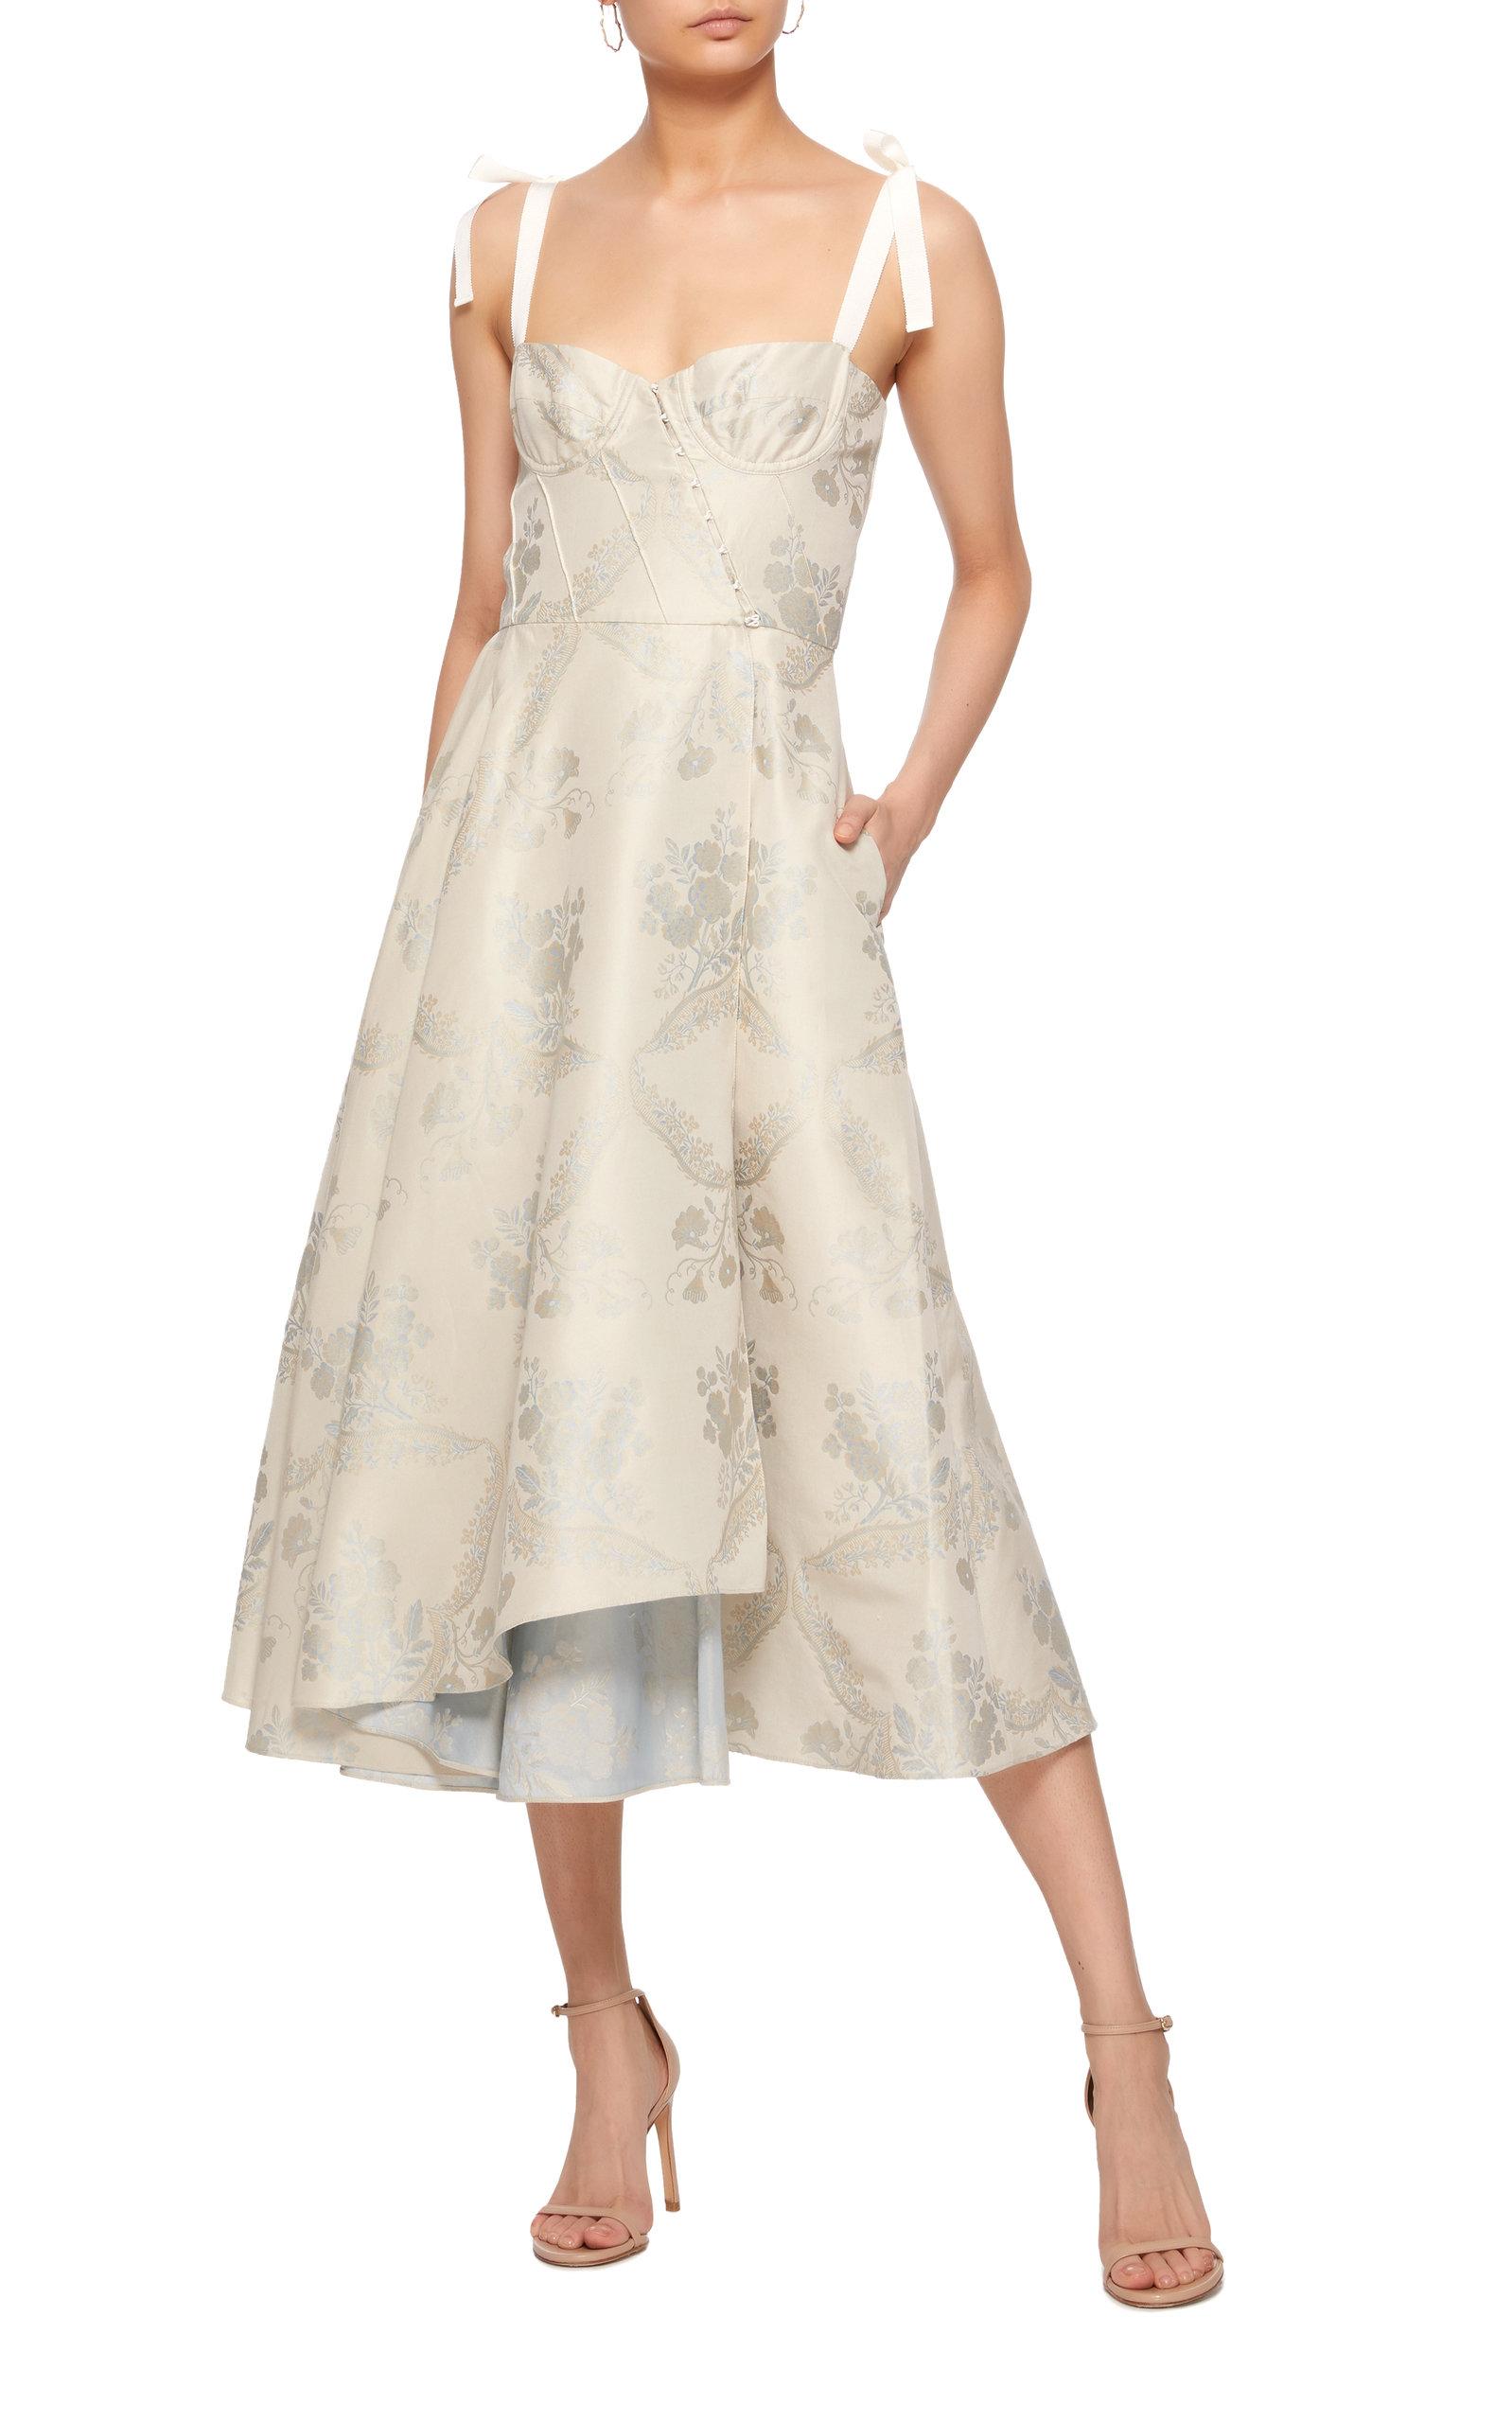 Orsola Floral Jacquard Midi Dress By Brock Collection Now Available On Moda Operandi Fancy Dresses Short Dresses Casual Taffeta Dress